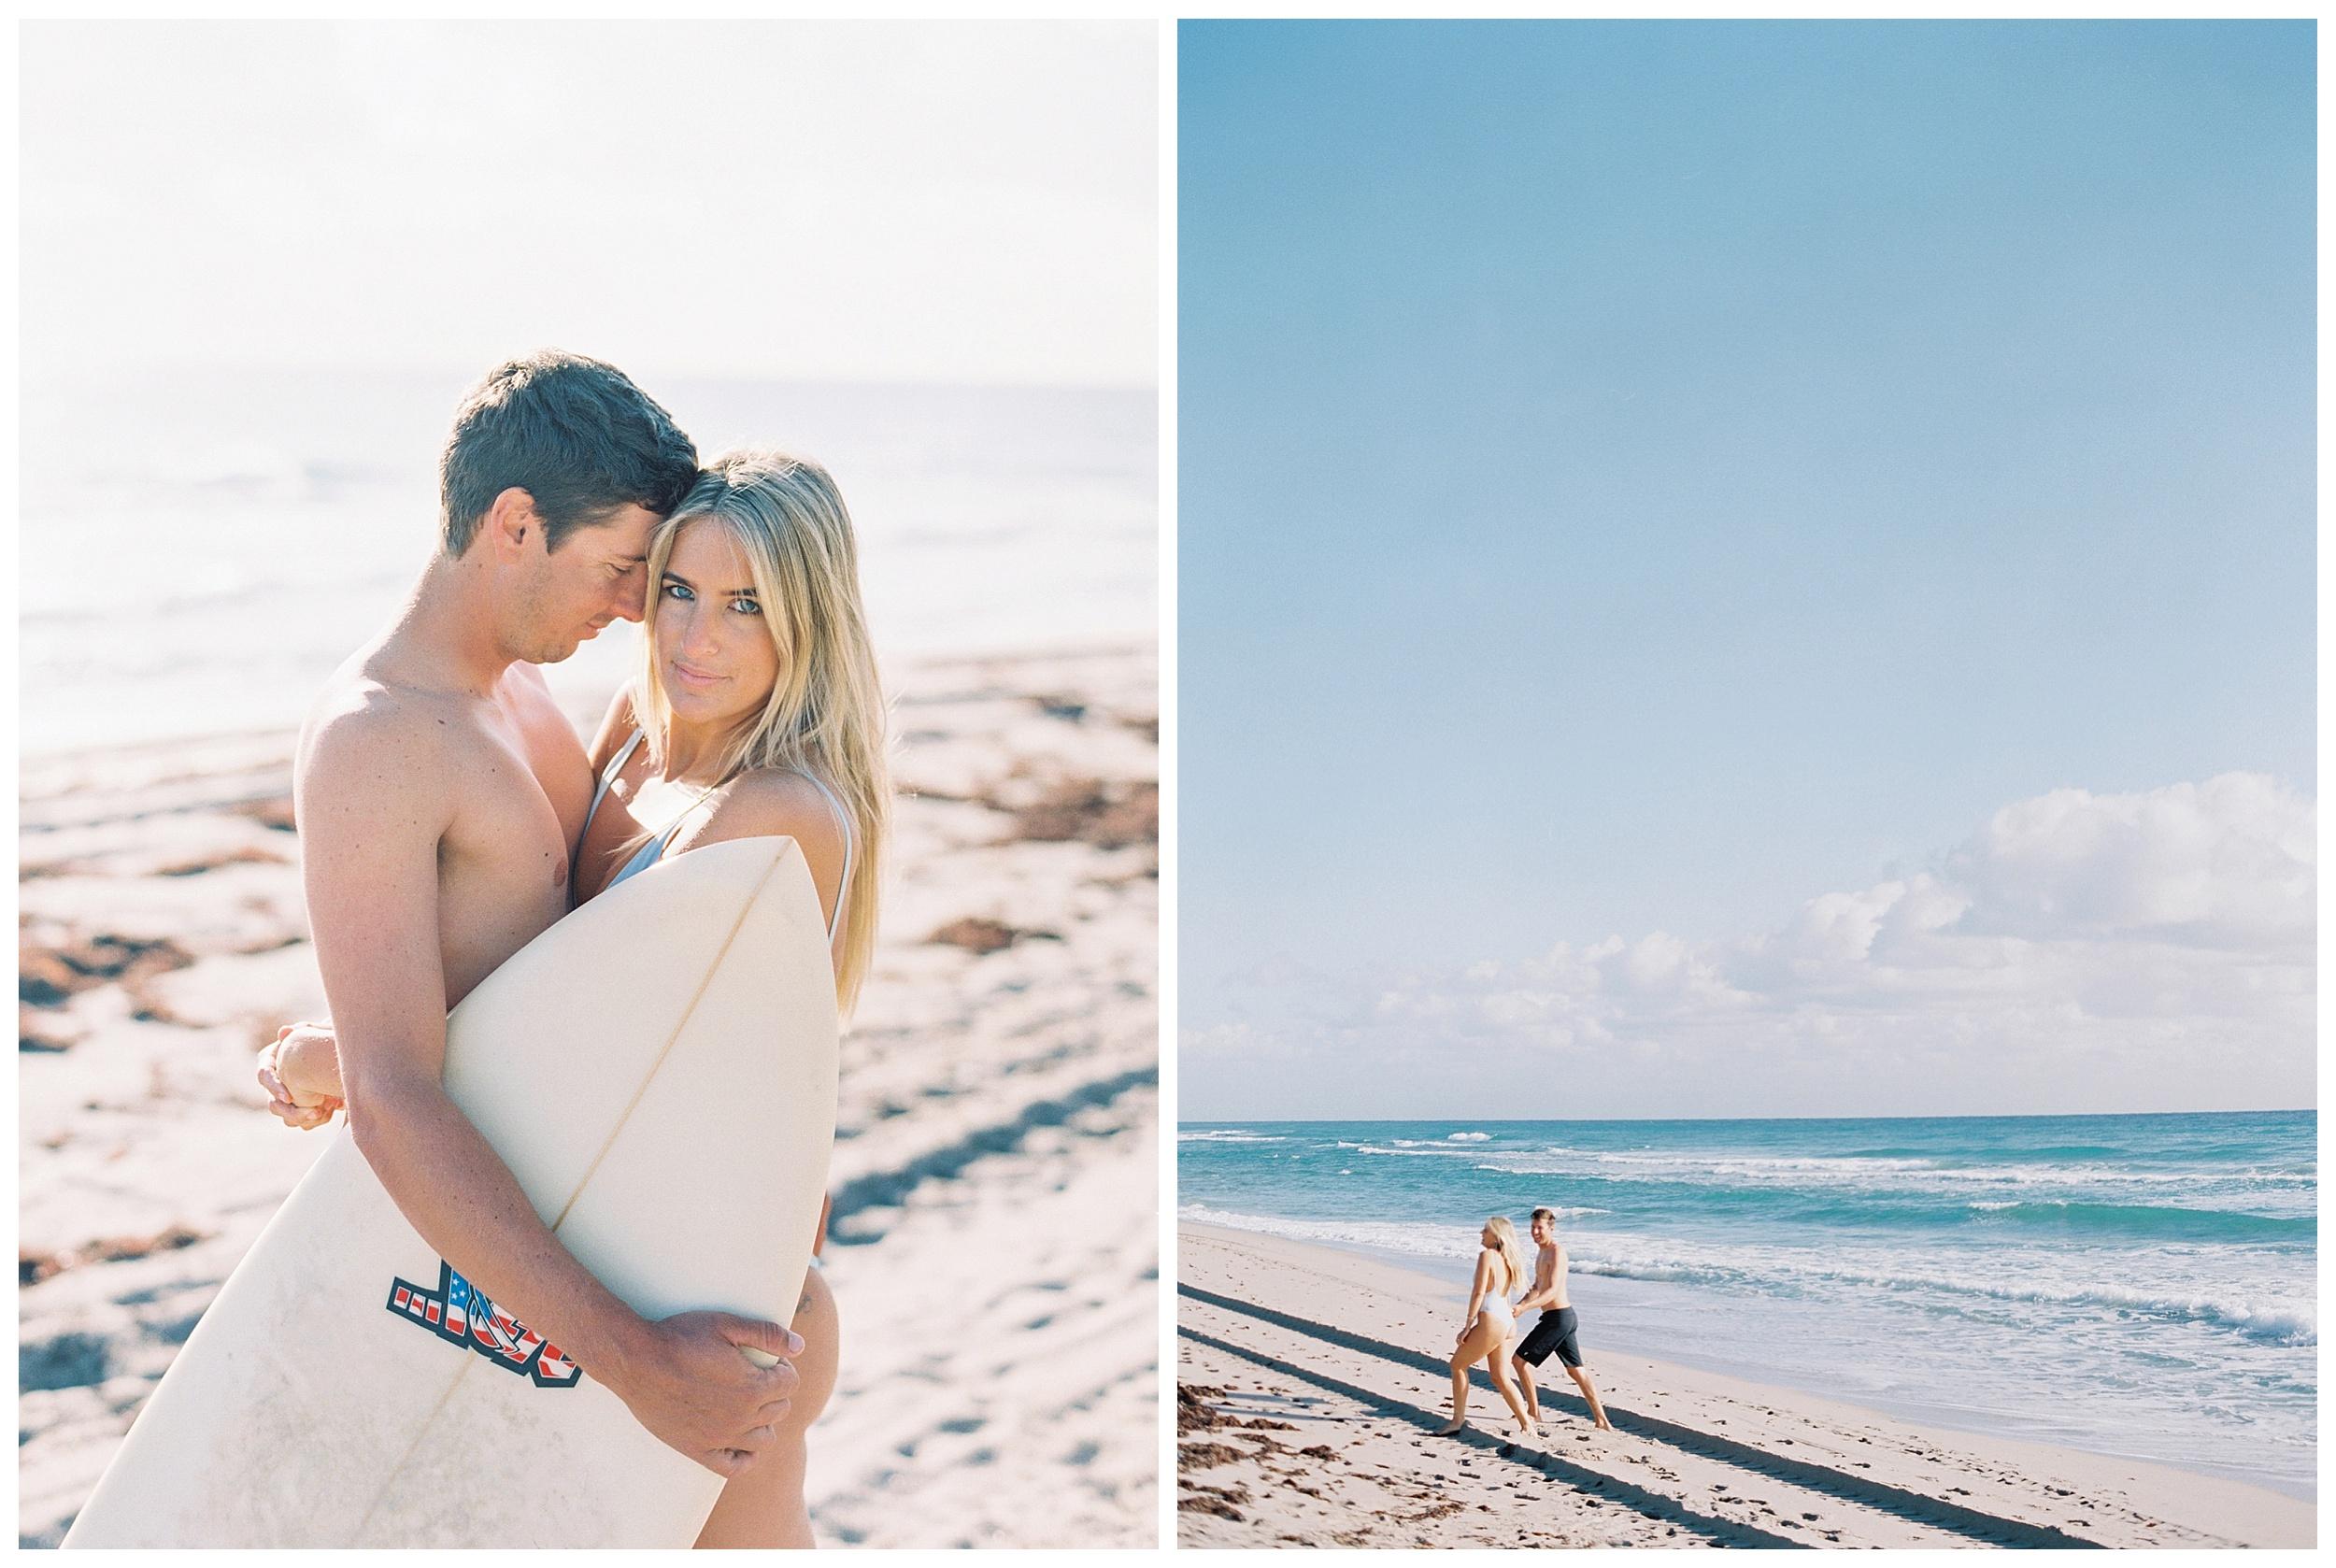 Surfboard Engagement Florida Wedding Photographer Kir Tuben_0006.jpg